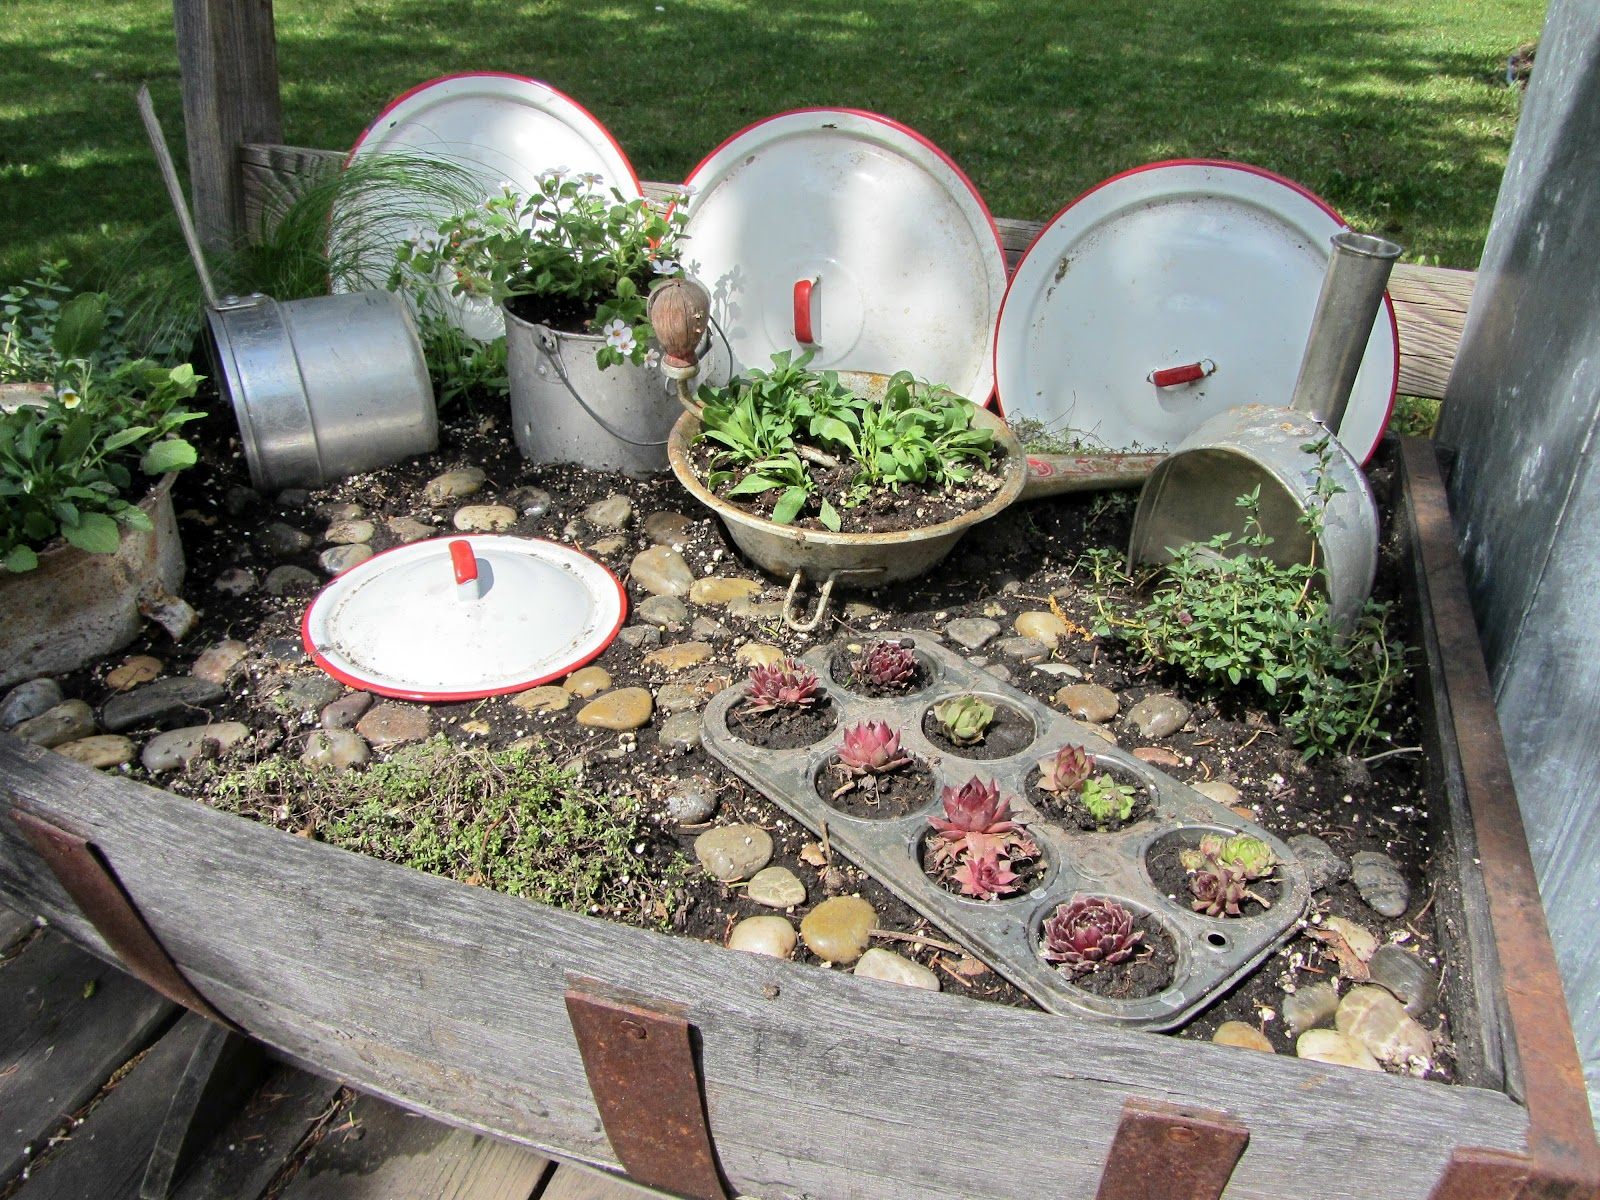 Kitchen fairy garden organized clutter solutioingenieria Choice Image